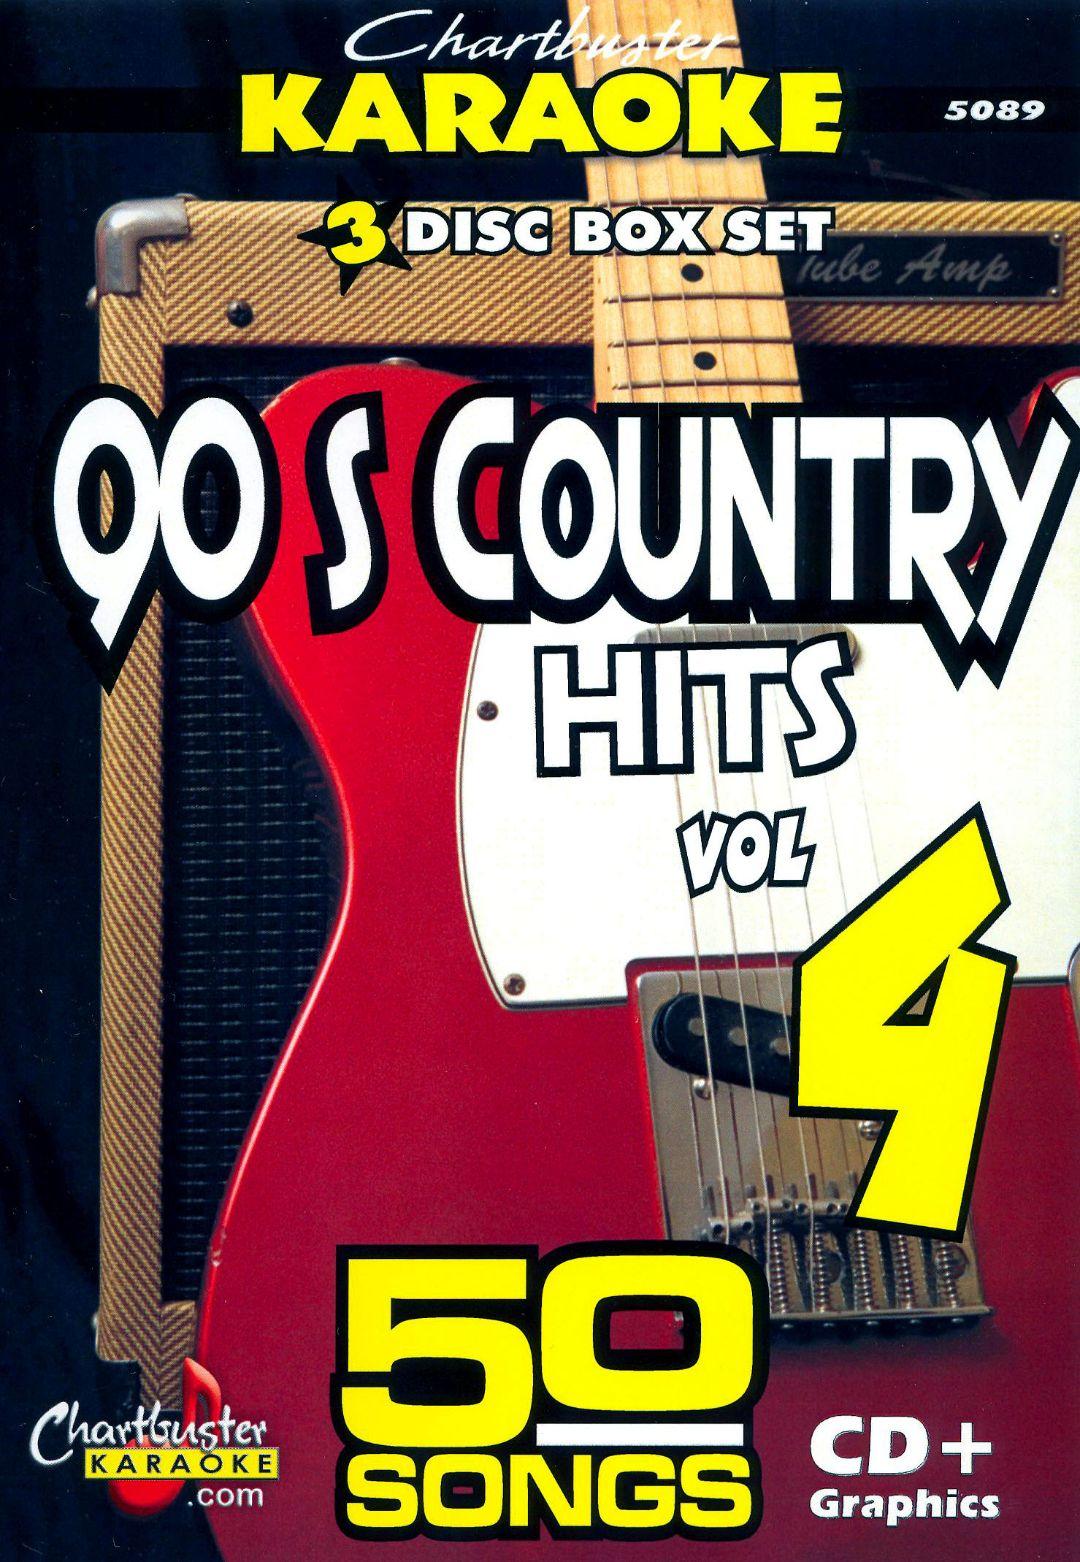 Karaoke: 90's Country Hits, Vol. 4